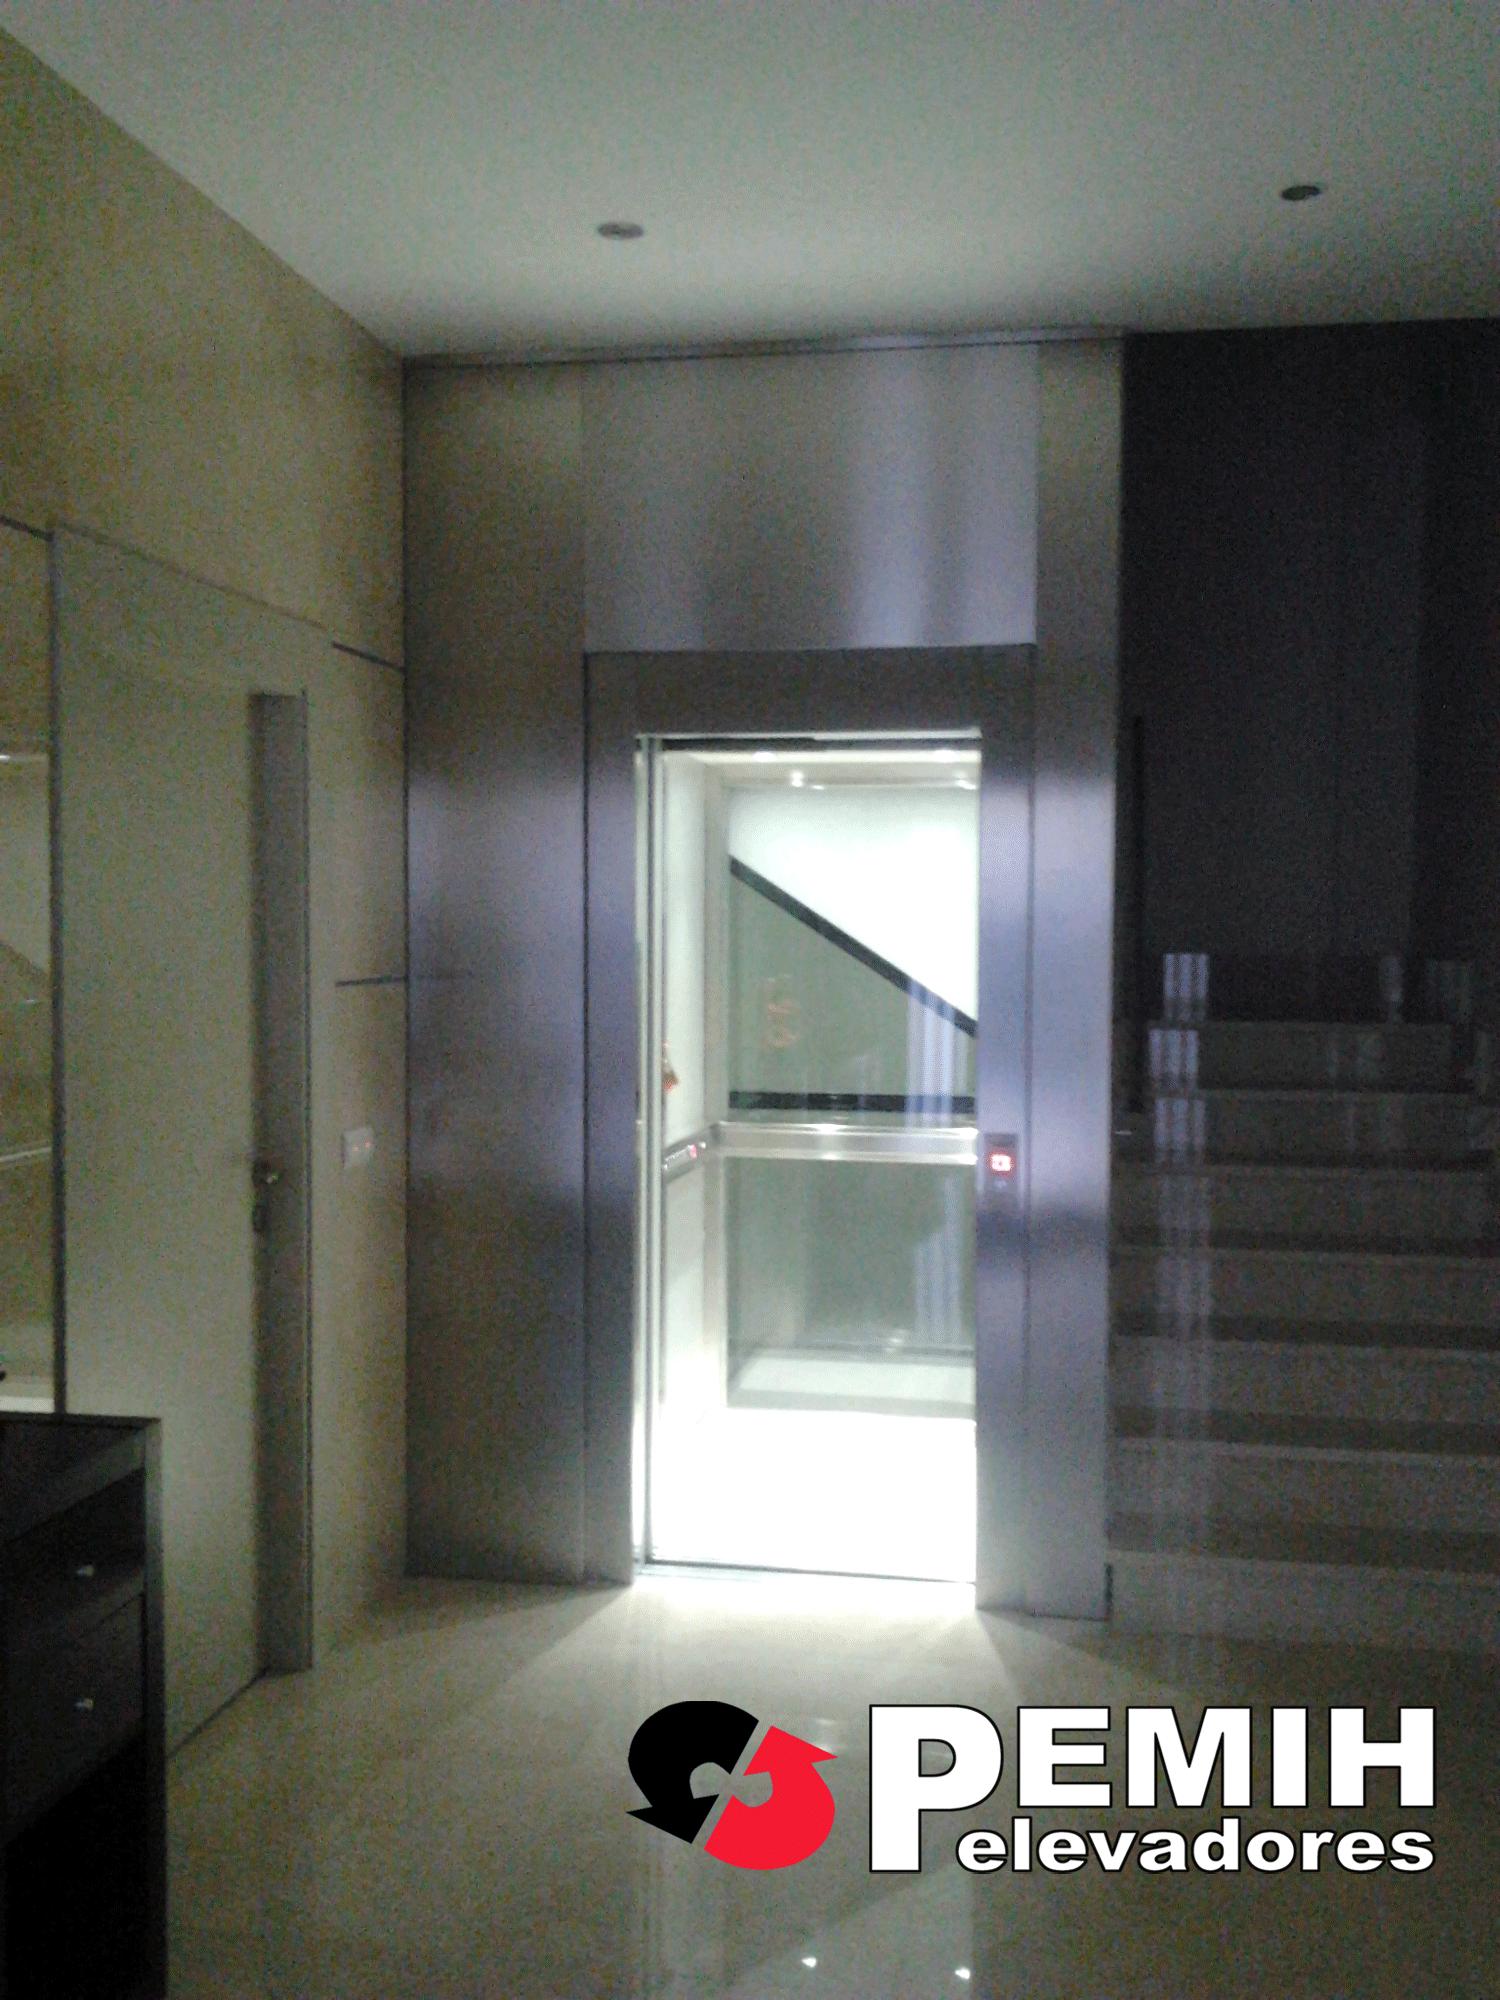 mantenimiento ascensores castellón